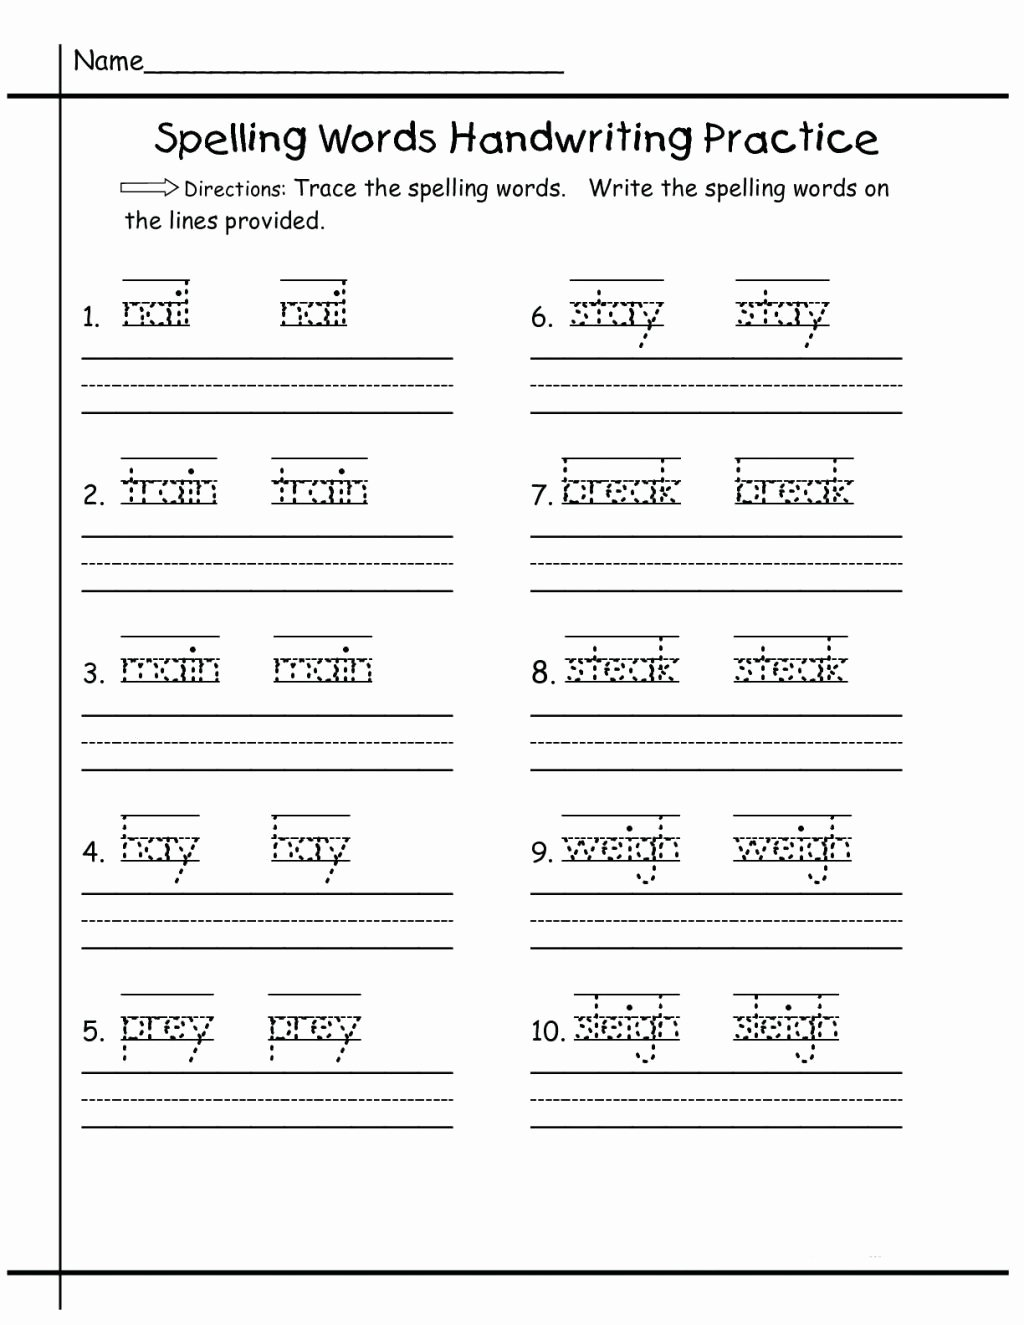 Practice Handwriting Worksheets for Preschoolers Fresh Worksheet Freele Handwriting Worksheets for Preschool